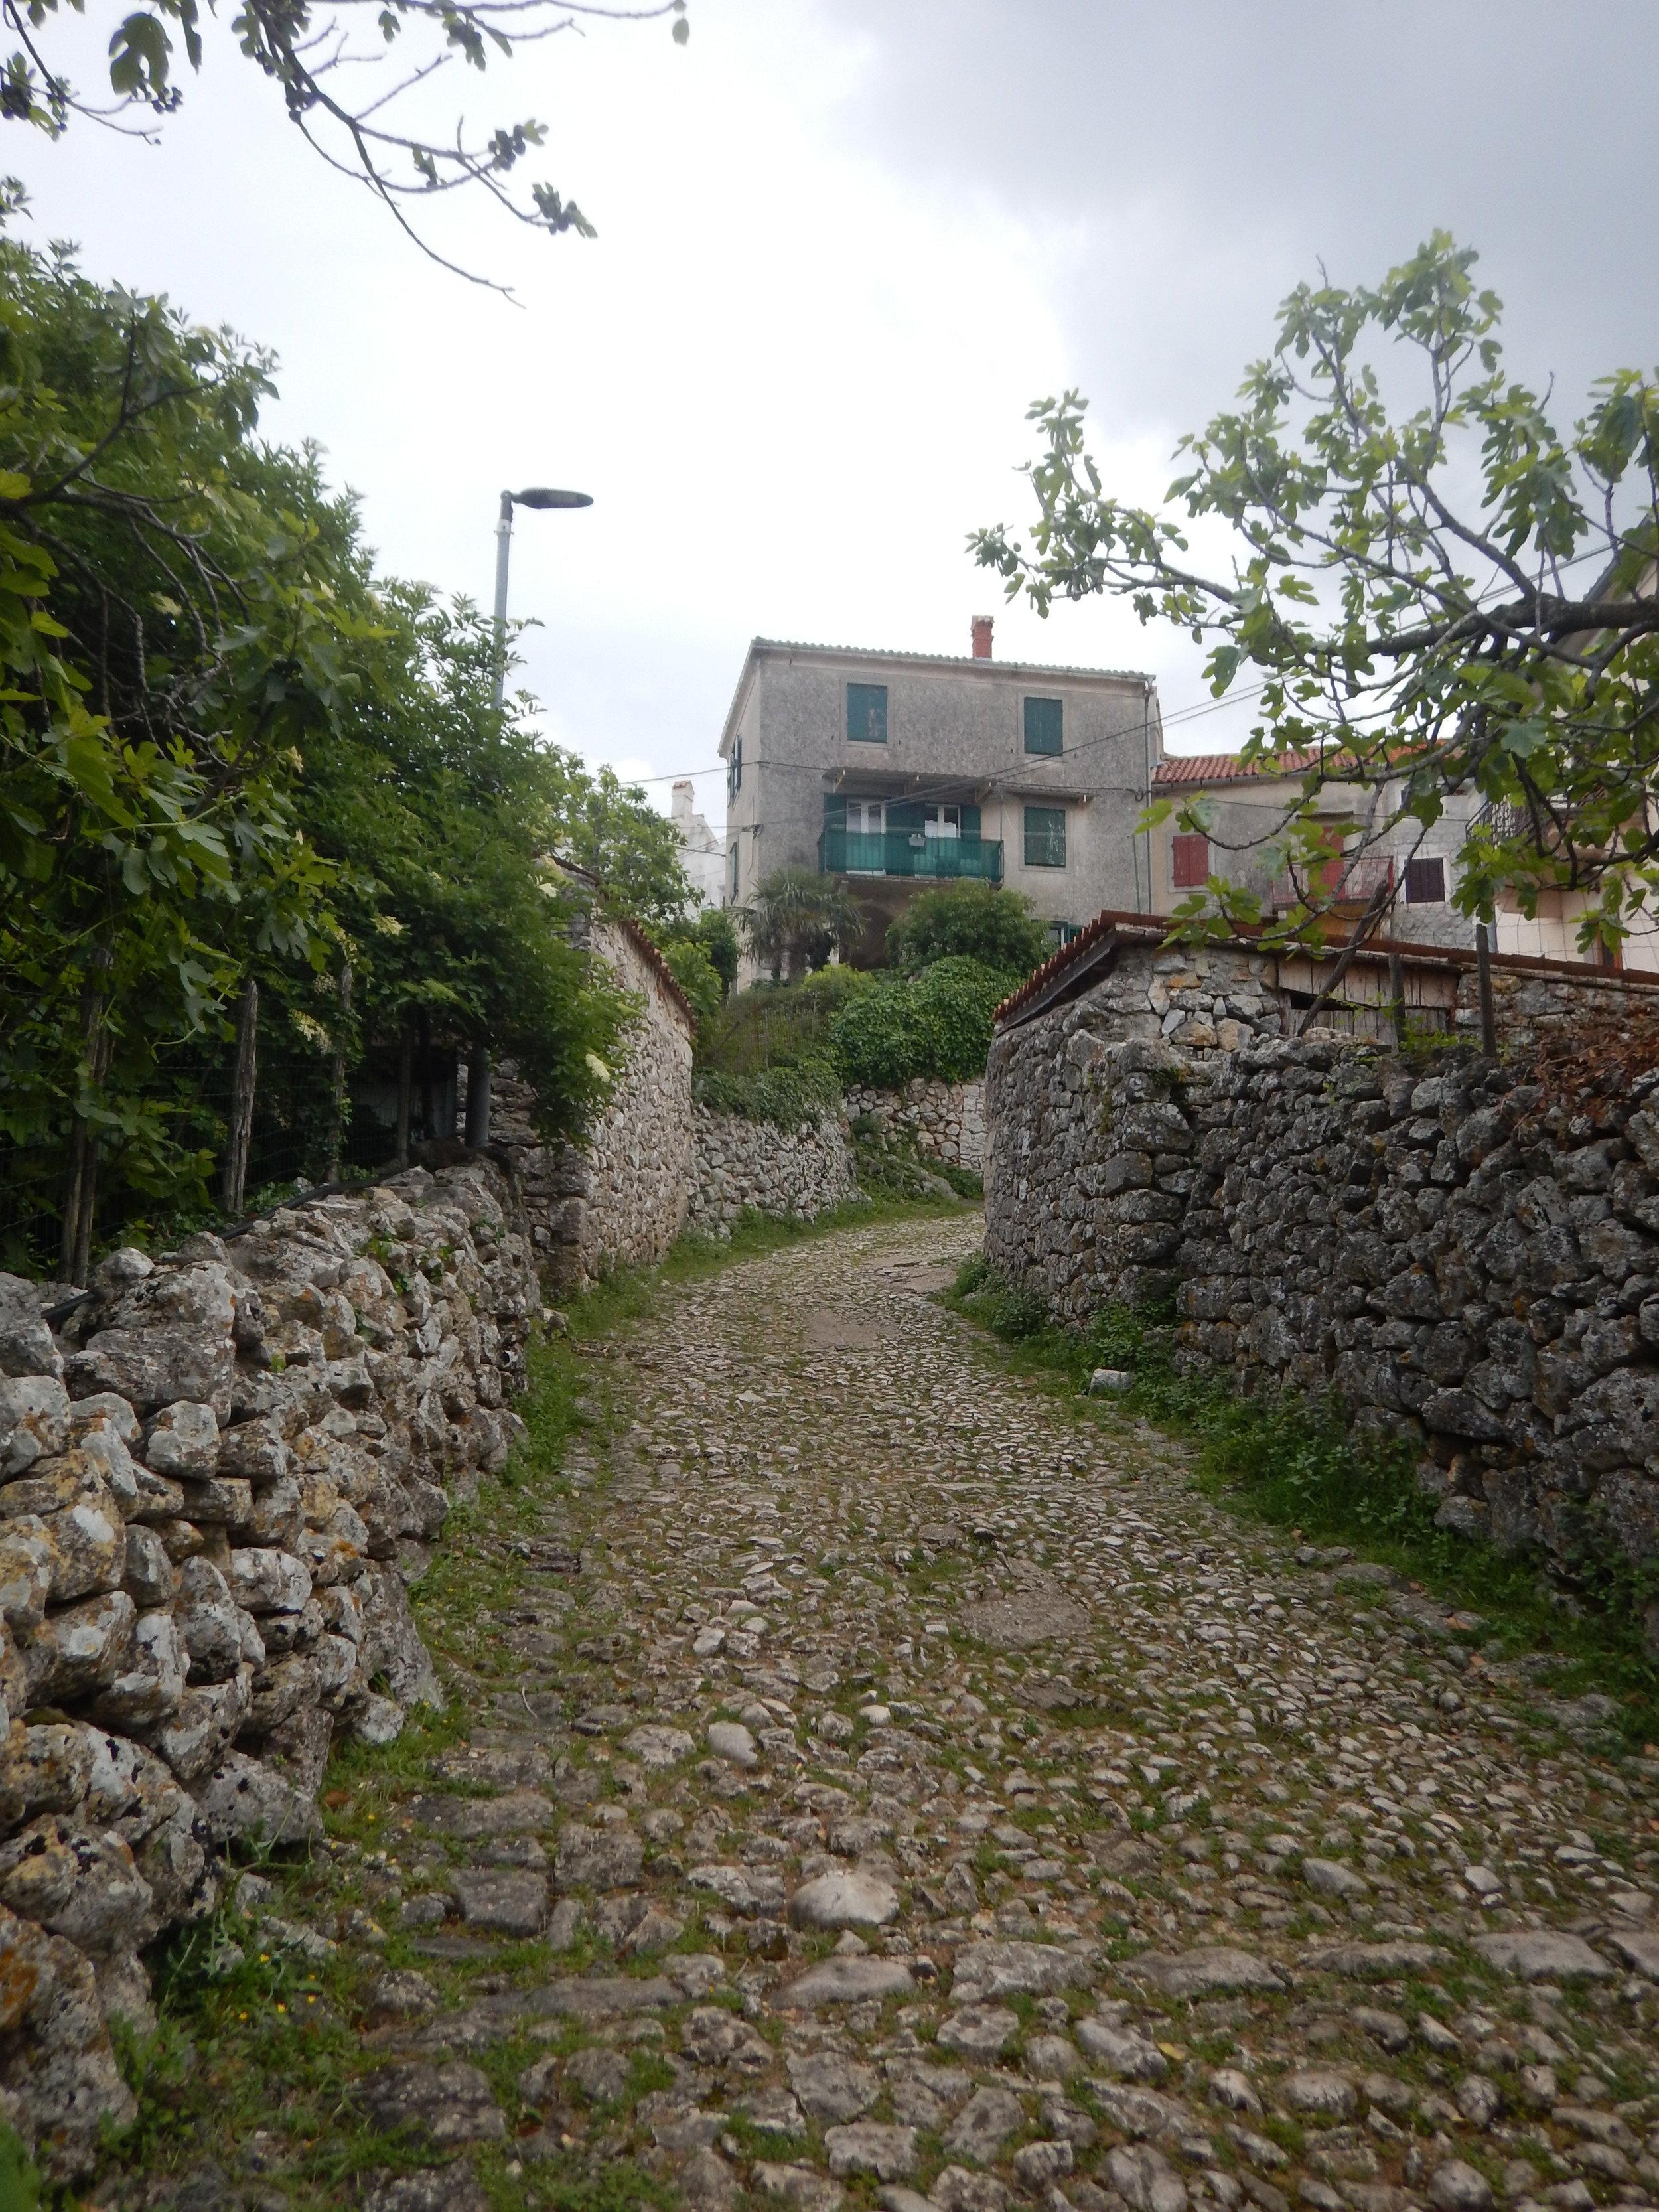 Entrance to delightful village of Beli